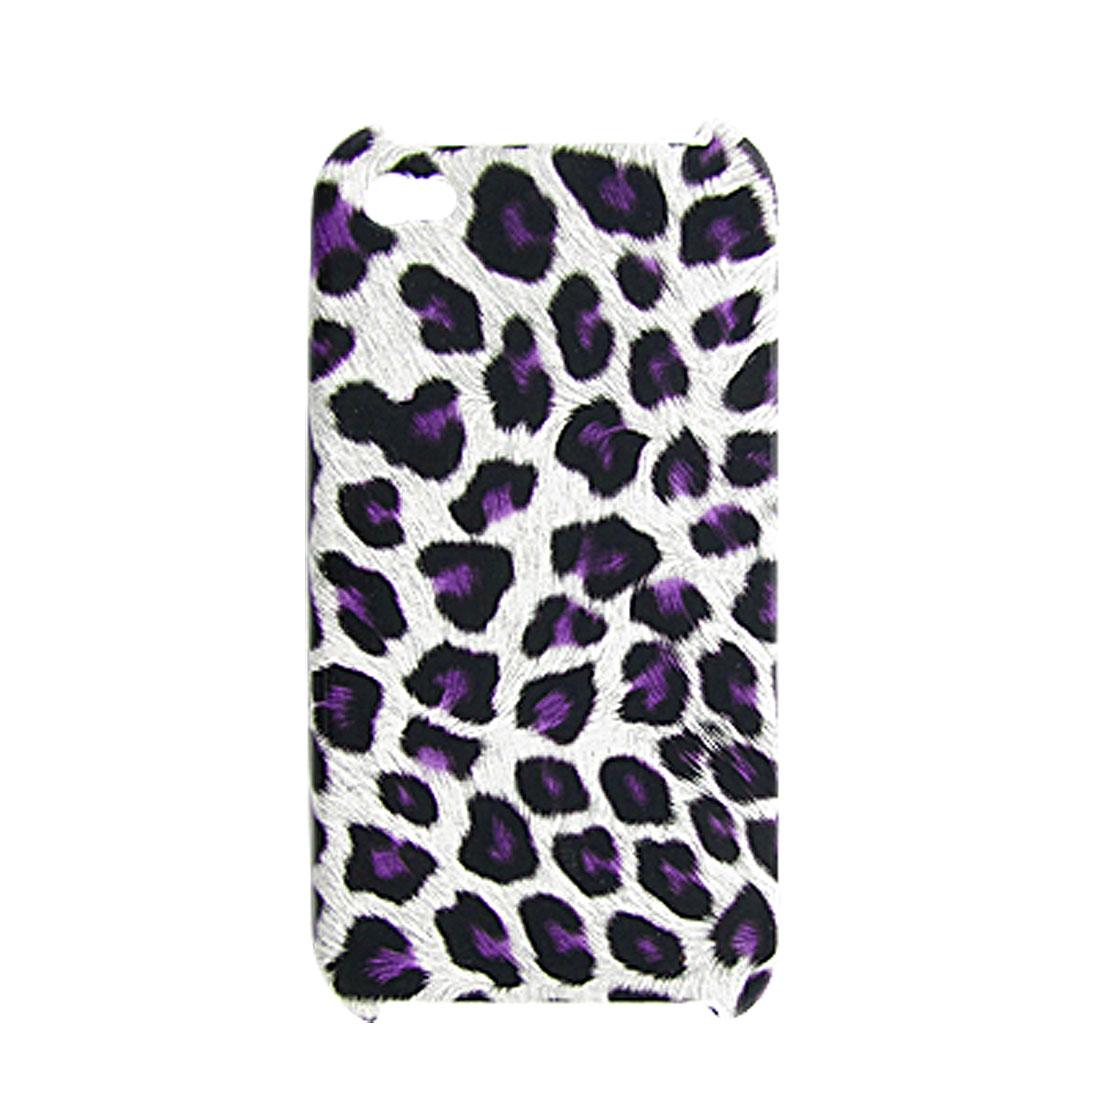 Purple Leopard Pattern Plastic Back Shield Case for iPhone 4 4G